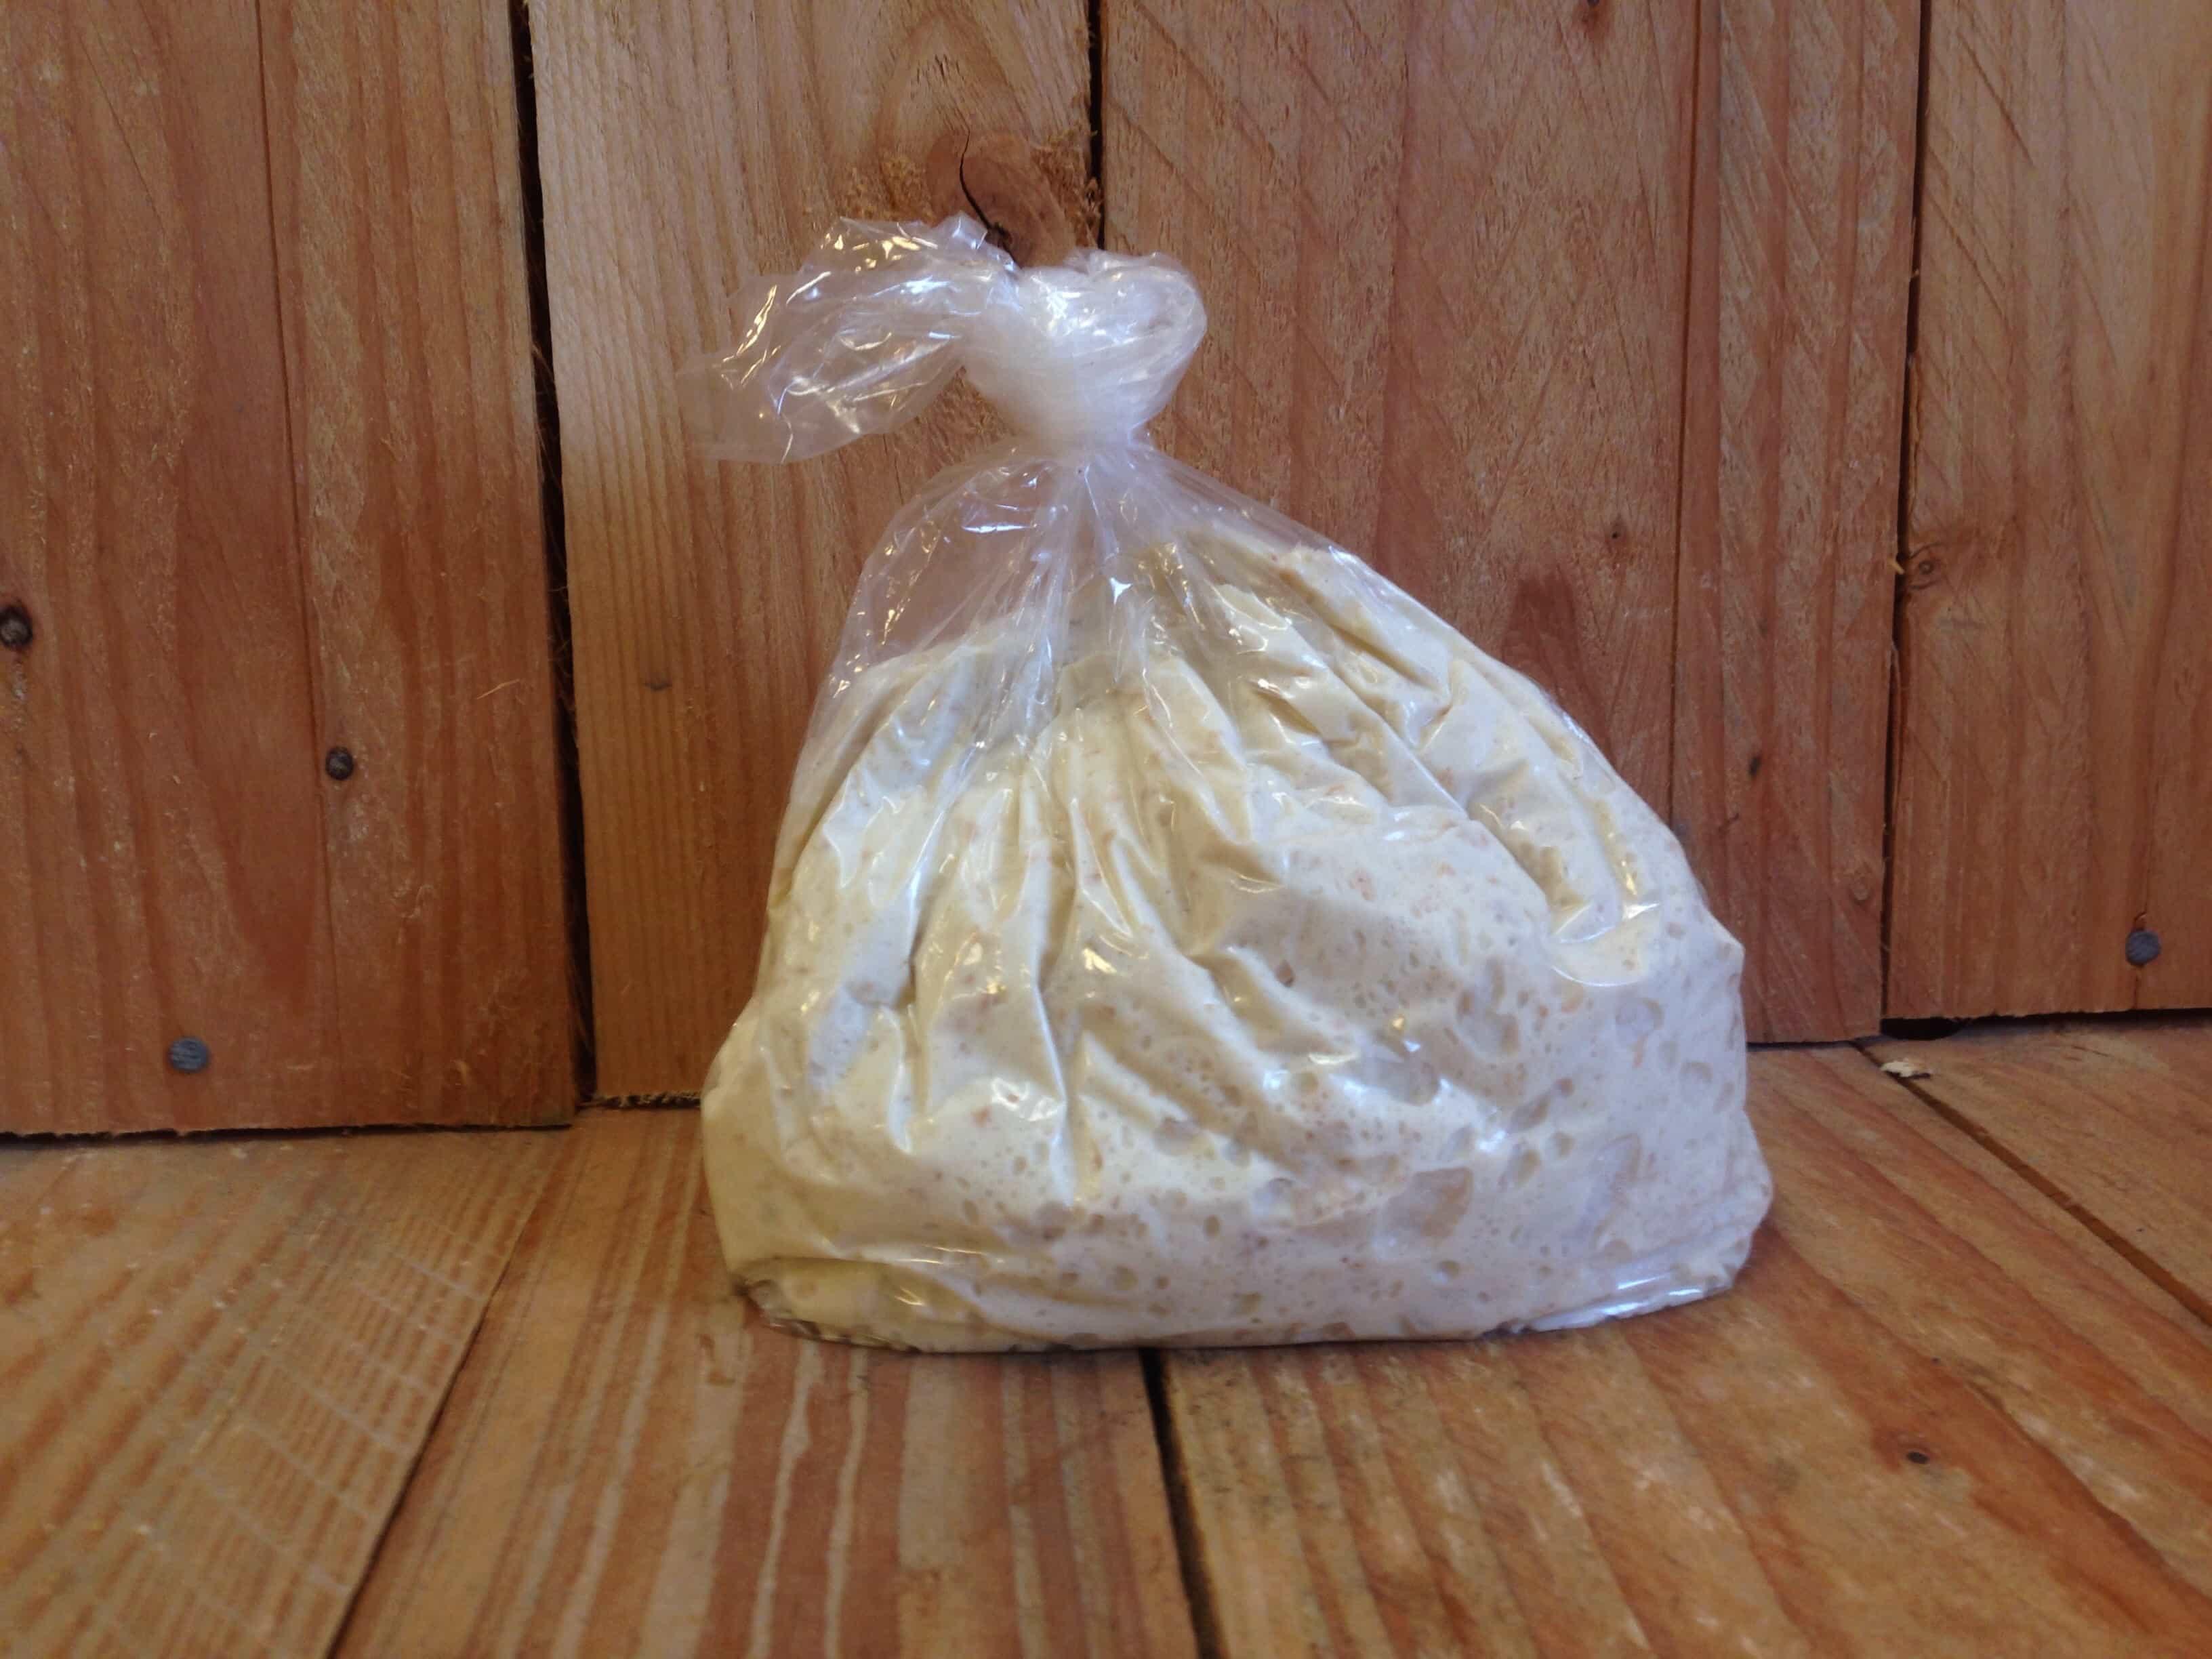 Wild Oat Bakery – Pizza Dough – White Sourdough (5oz/5-Inch Personal Pizza)